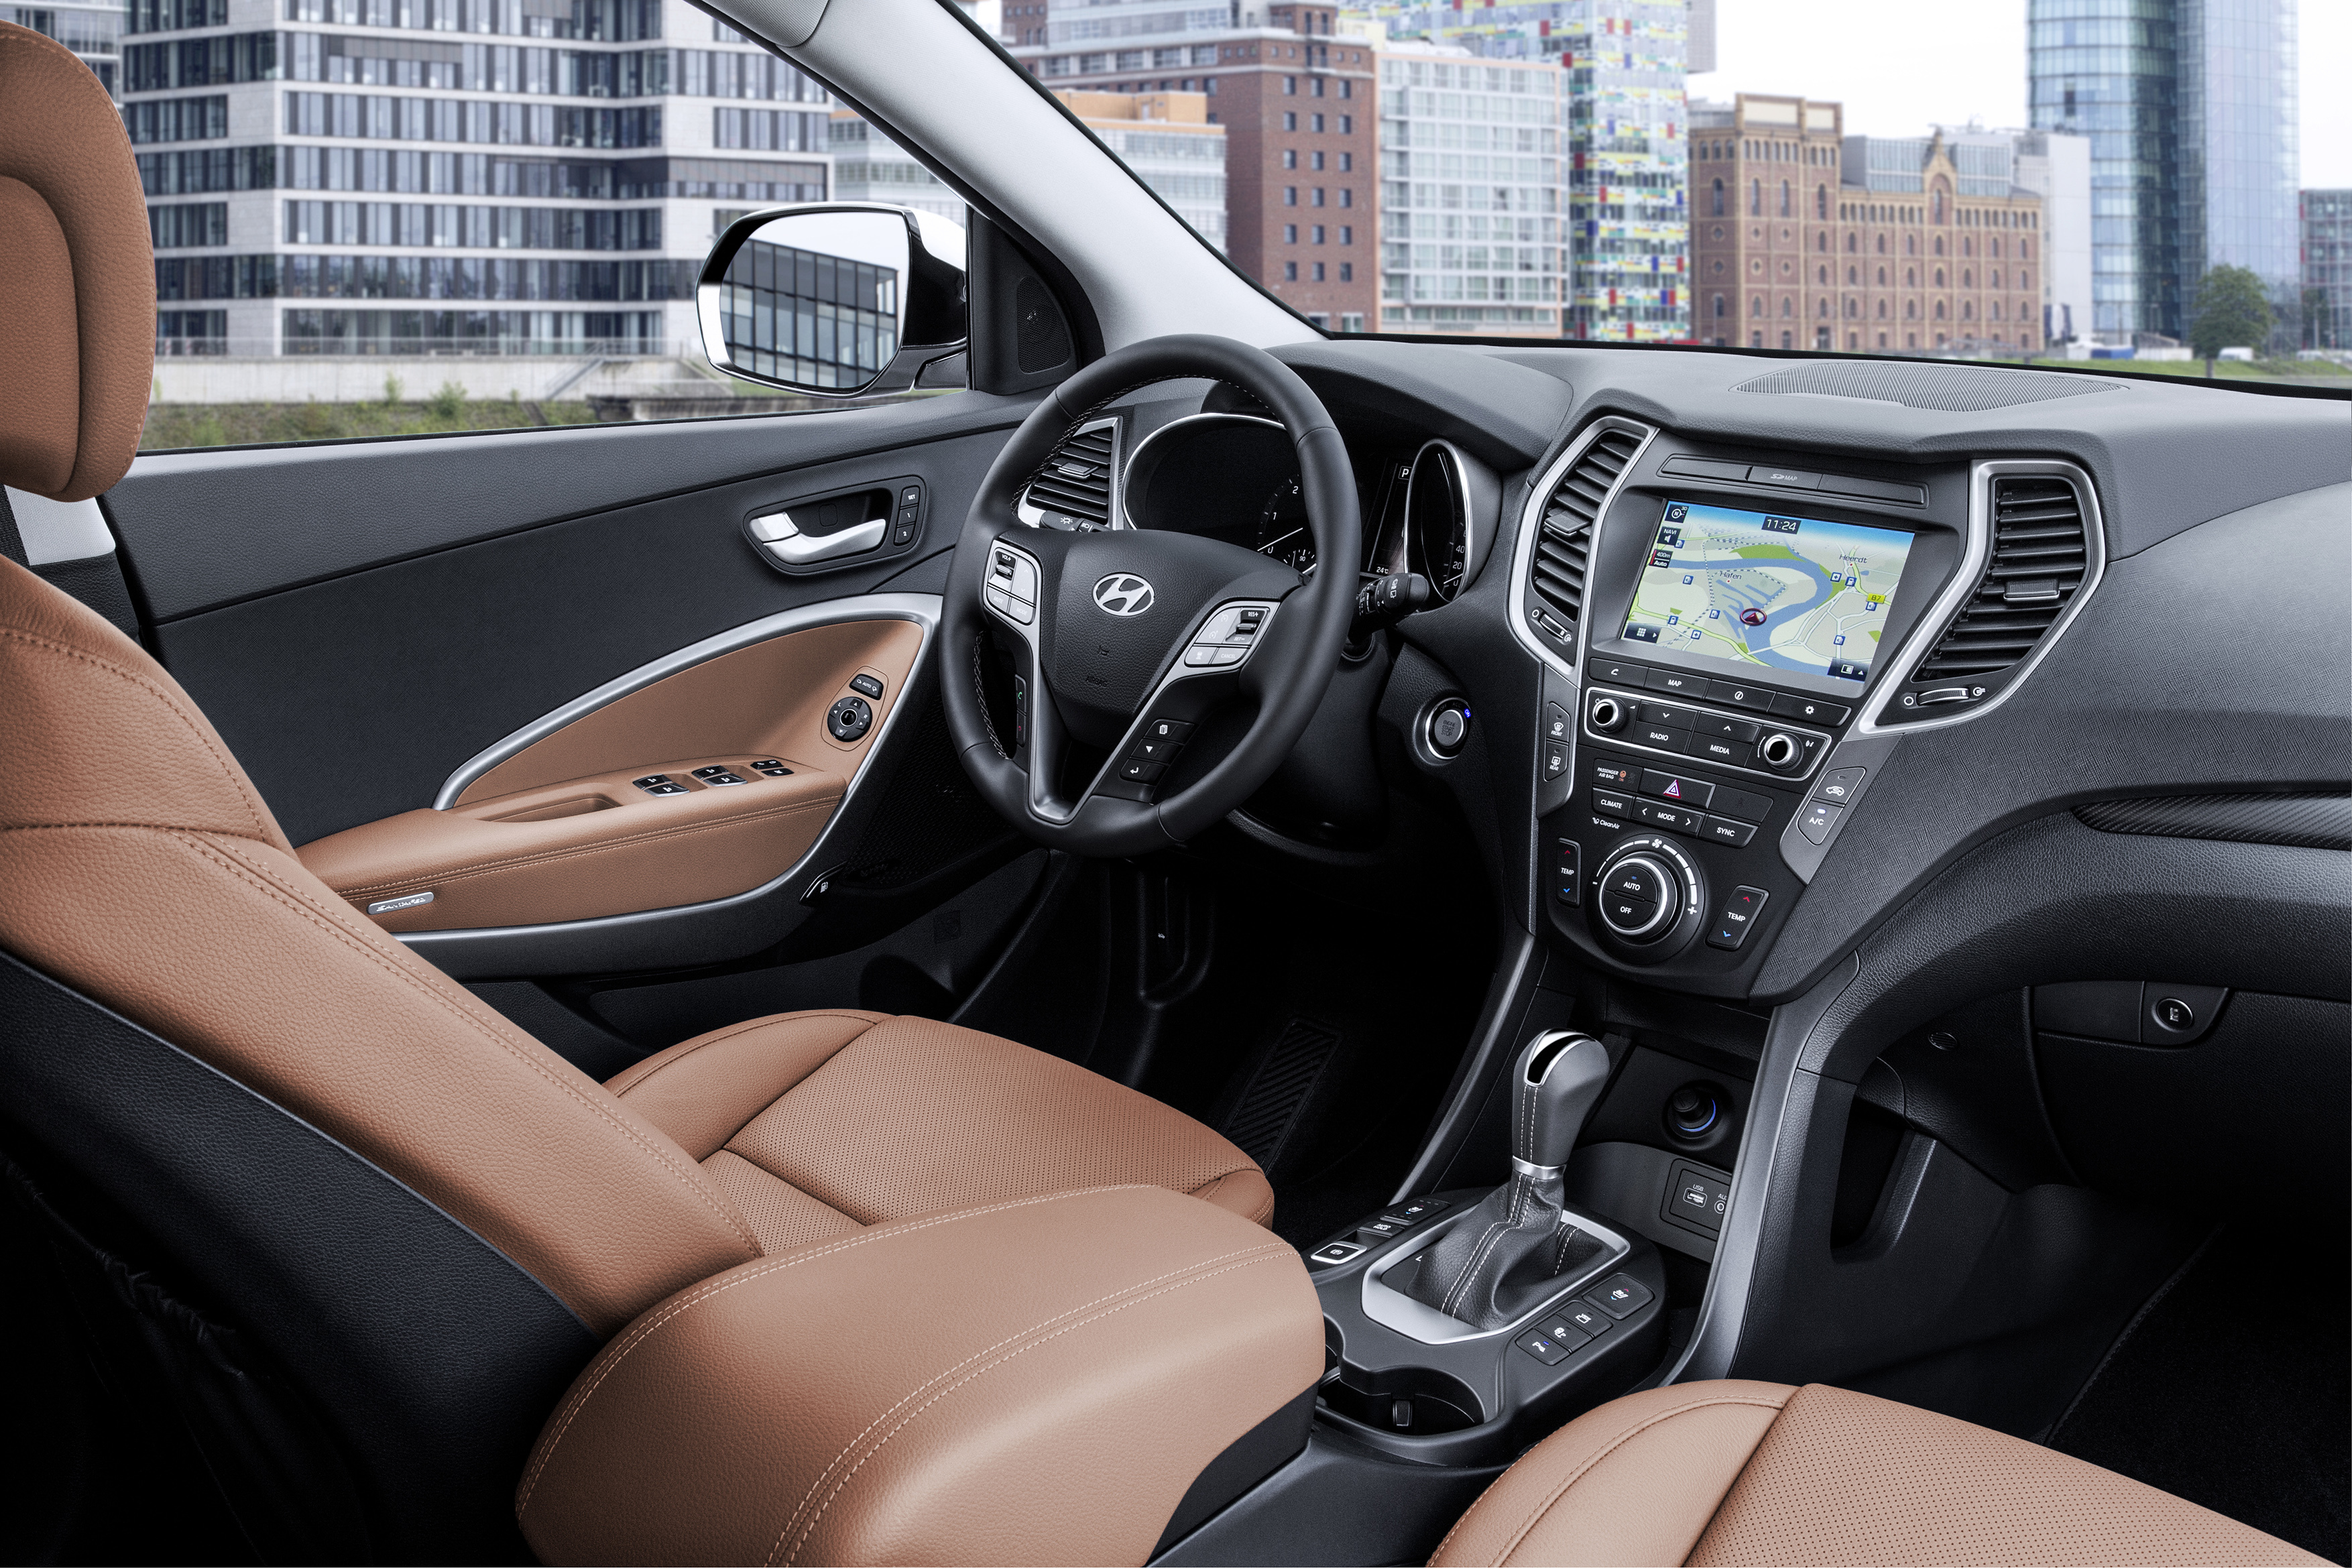 Hyundai Santa Fe Facelift I20 Active And I40 With Android